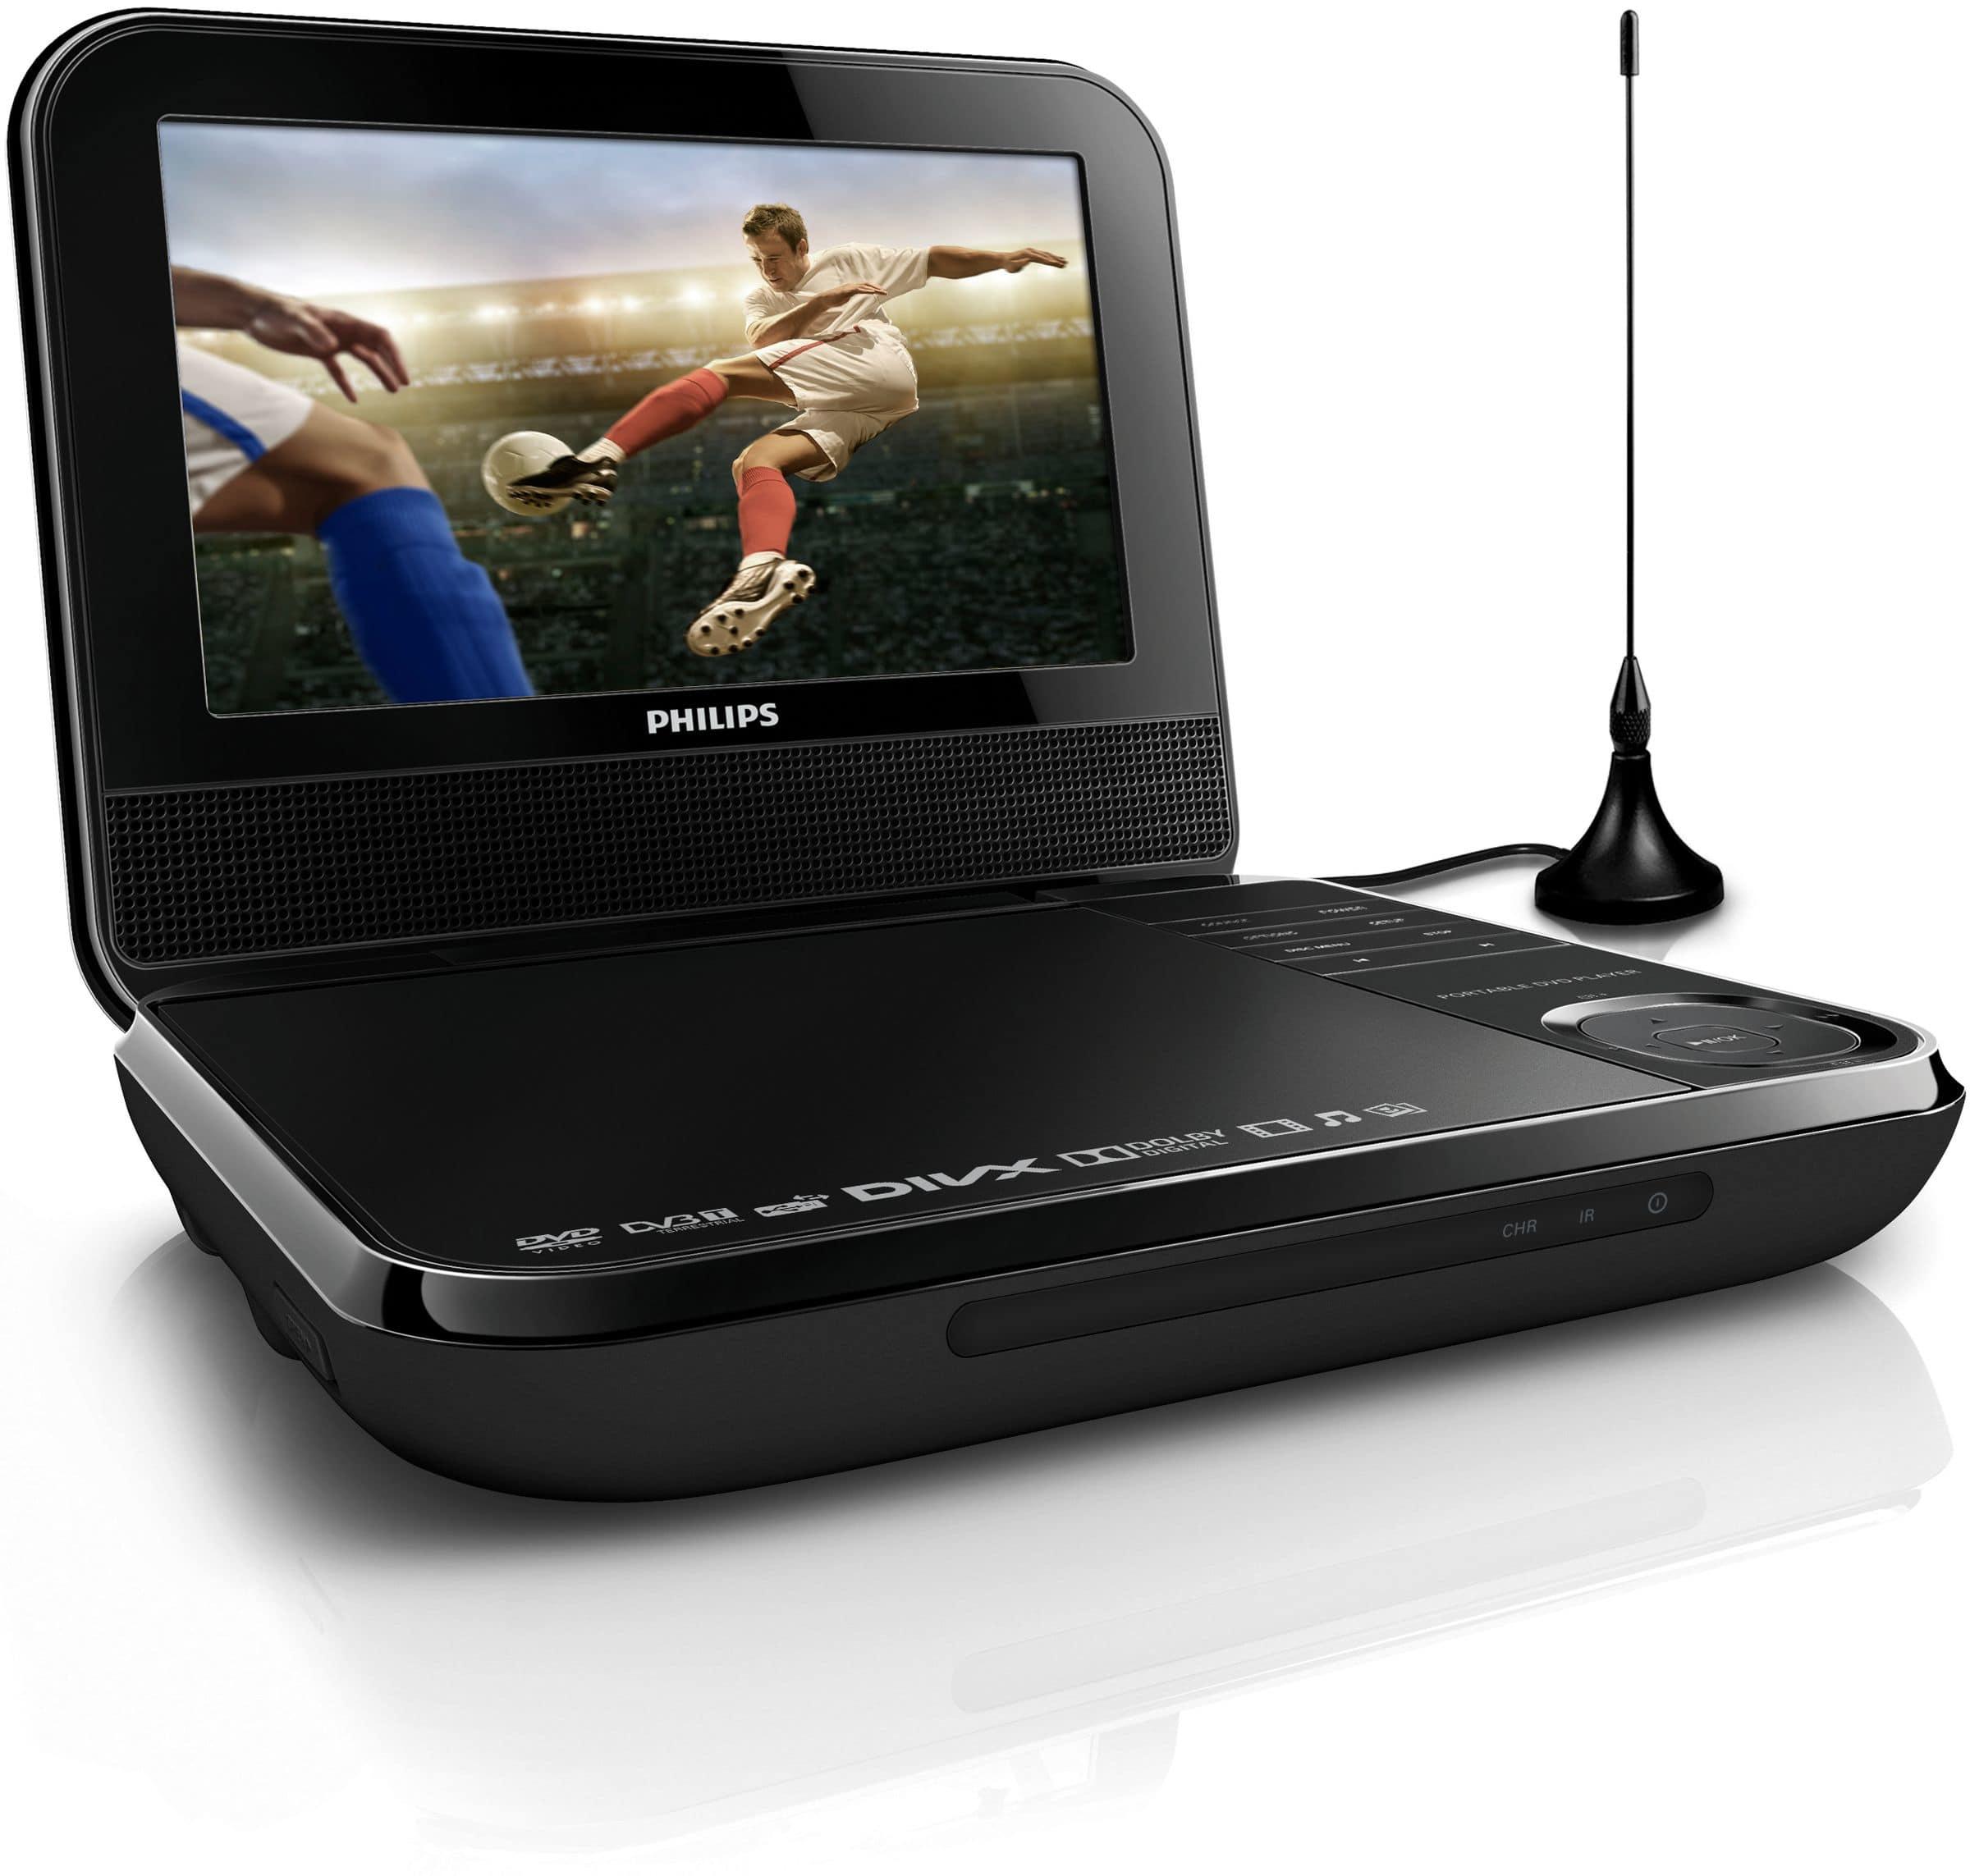 Philips PD7025/12 Tragbarer DVD-Player 17,8cm/7'' LCD TFT DVB-T für 149,99 Euro